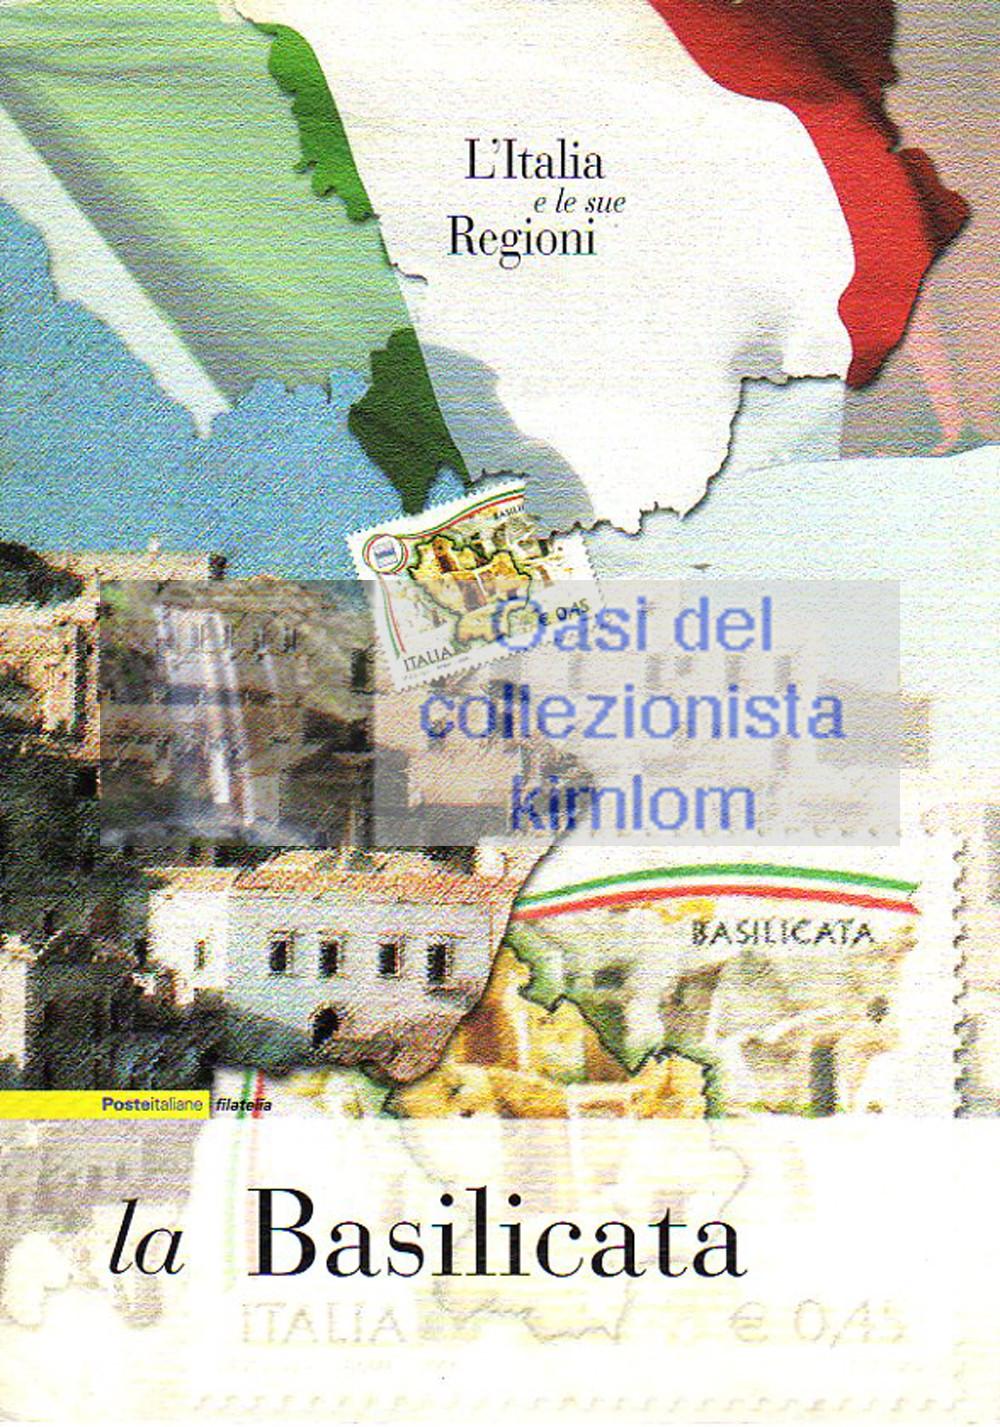 folder - L'Italia e le sue regioni - La Basilicata